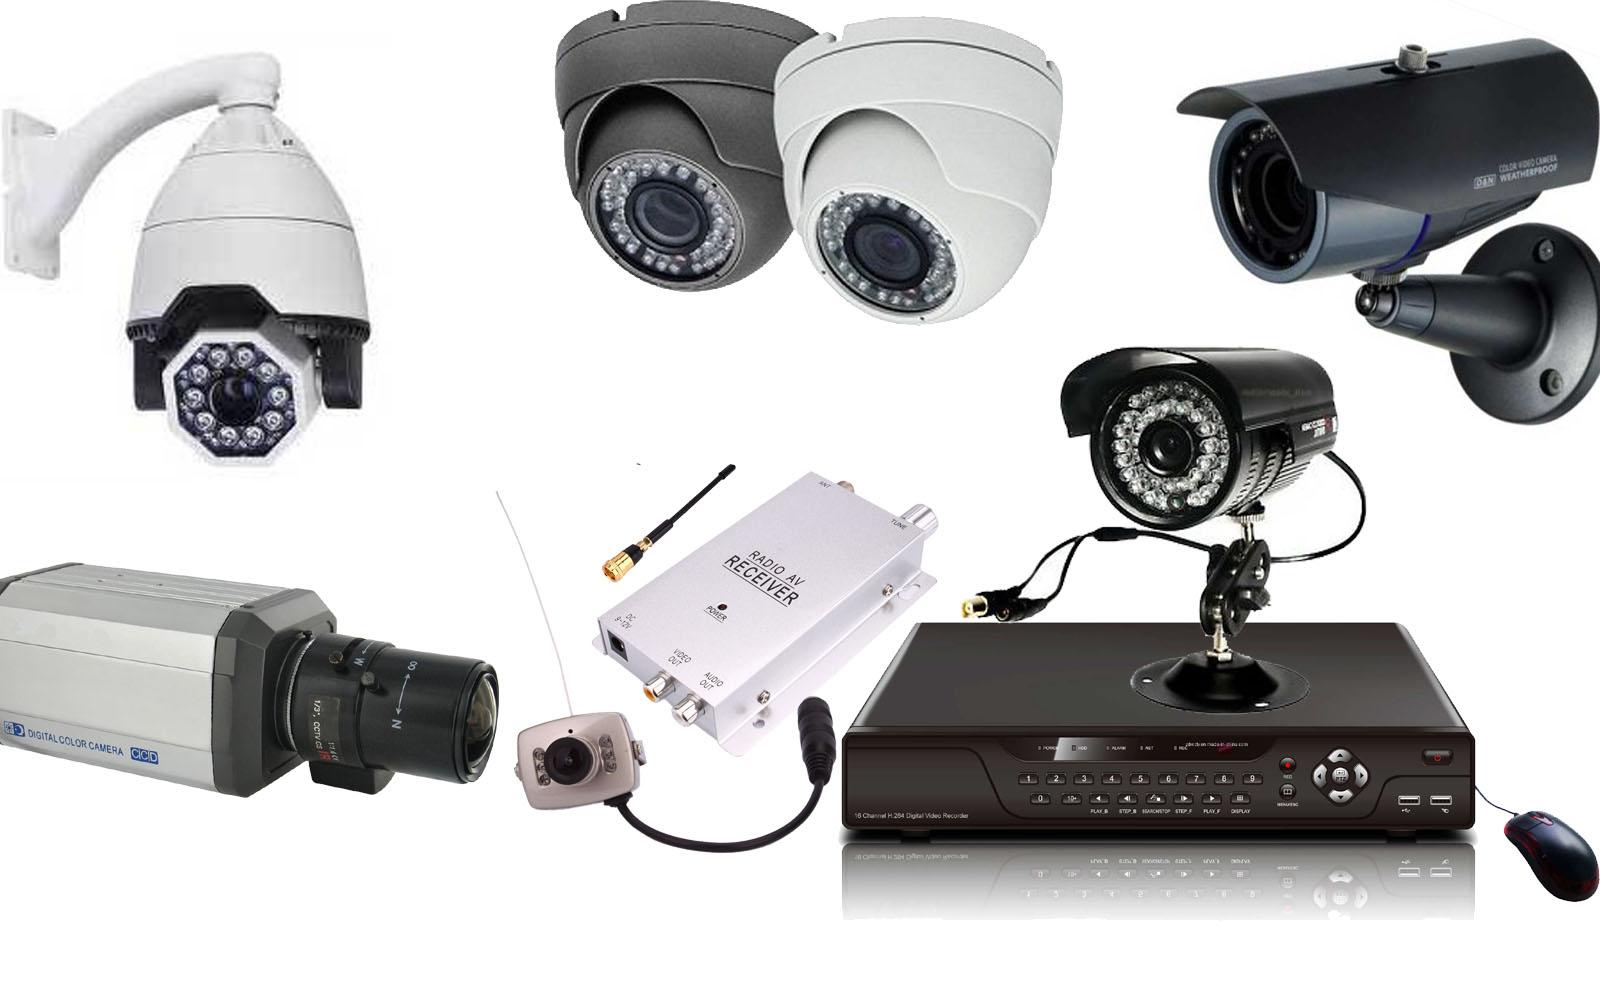 4 Things to Consider Before Buying CCTV Cameras in Kenya